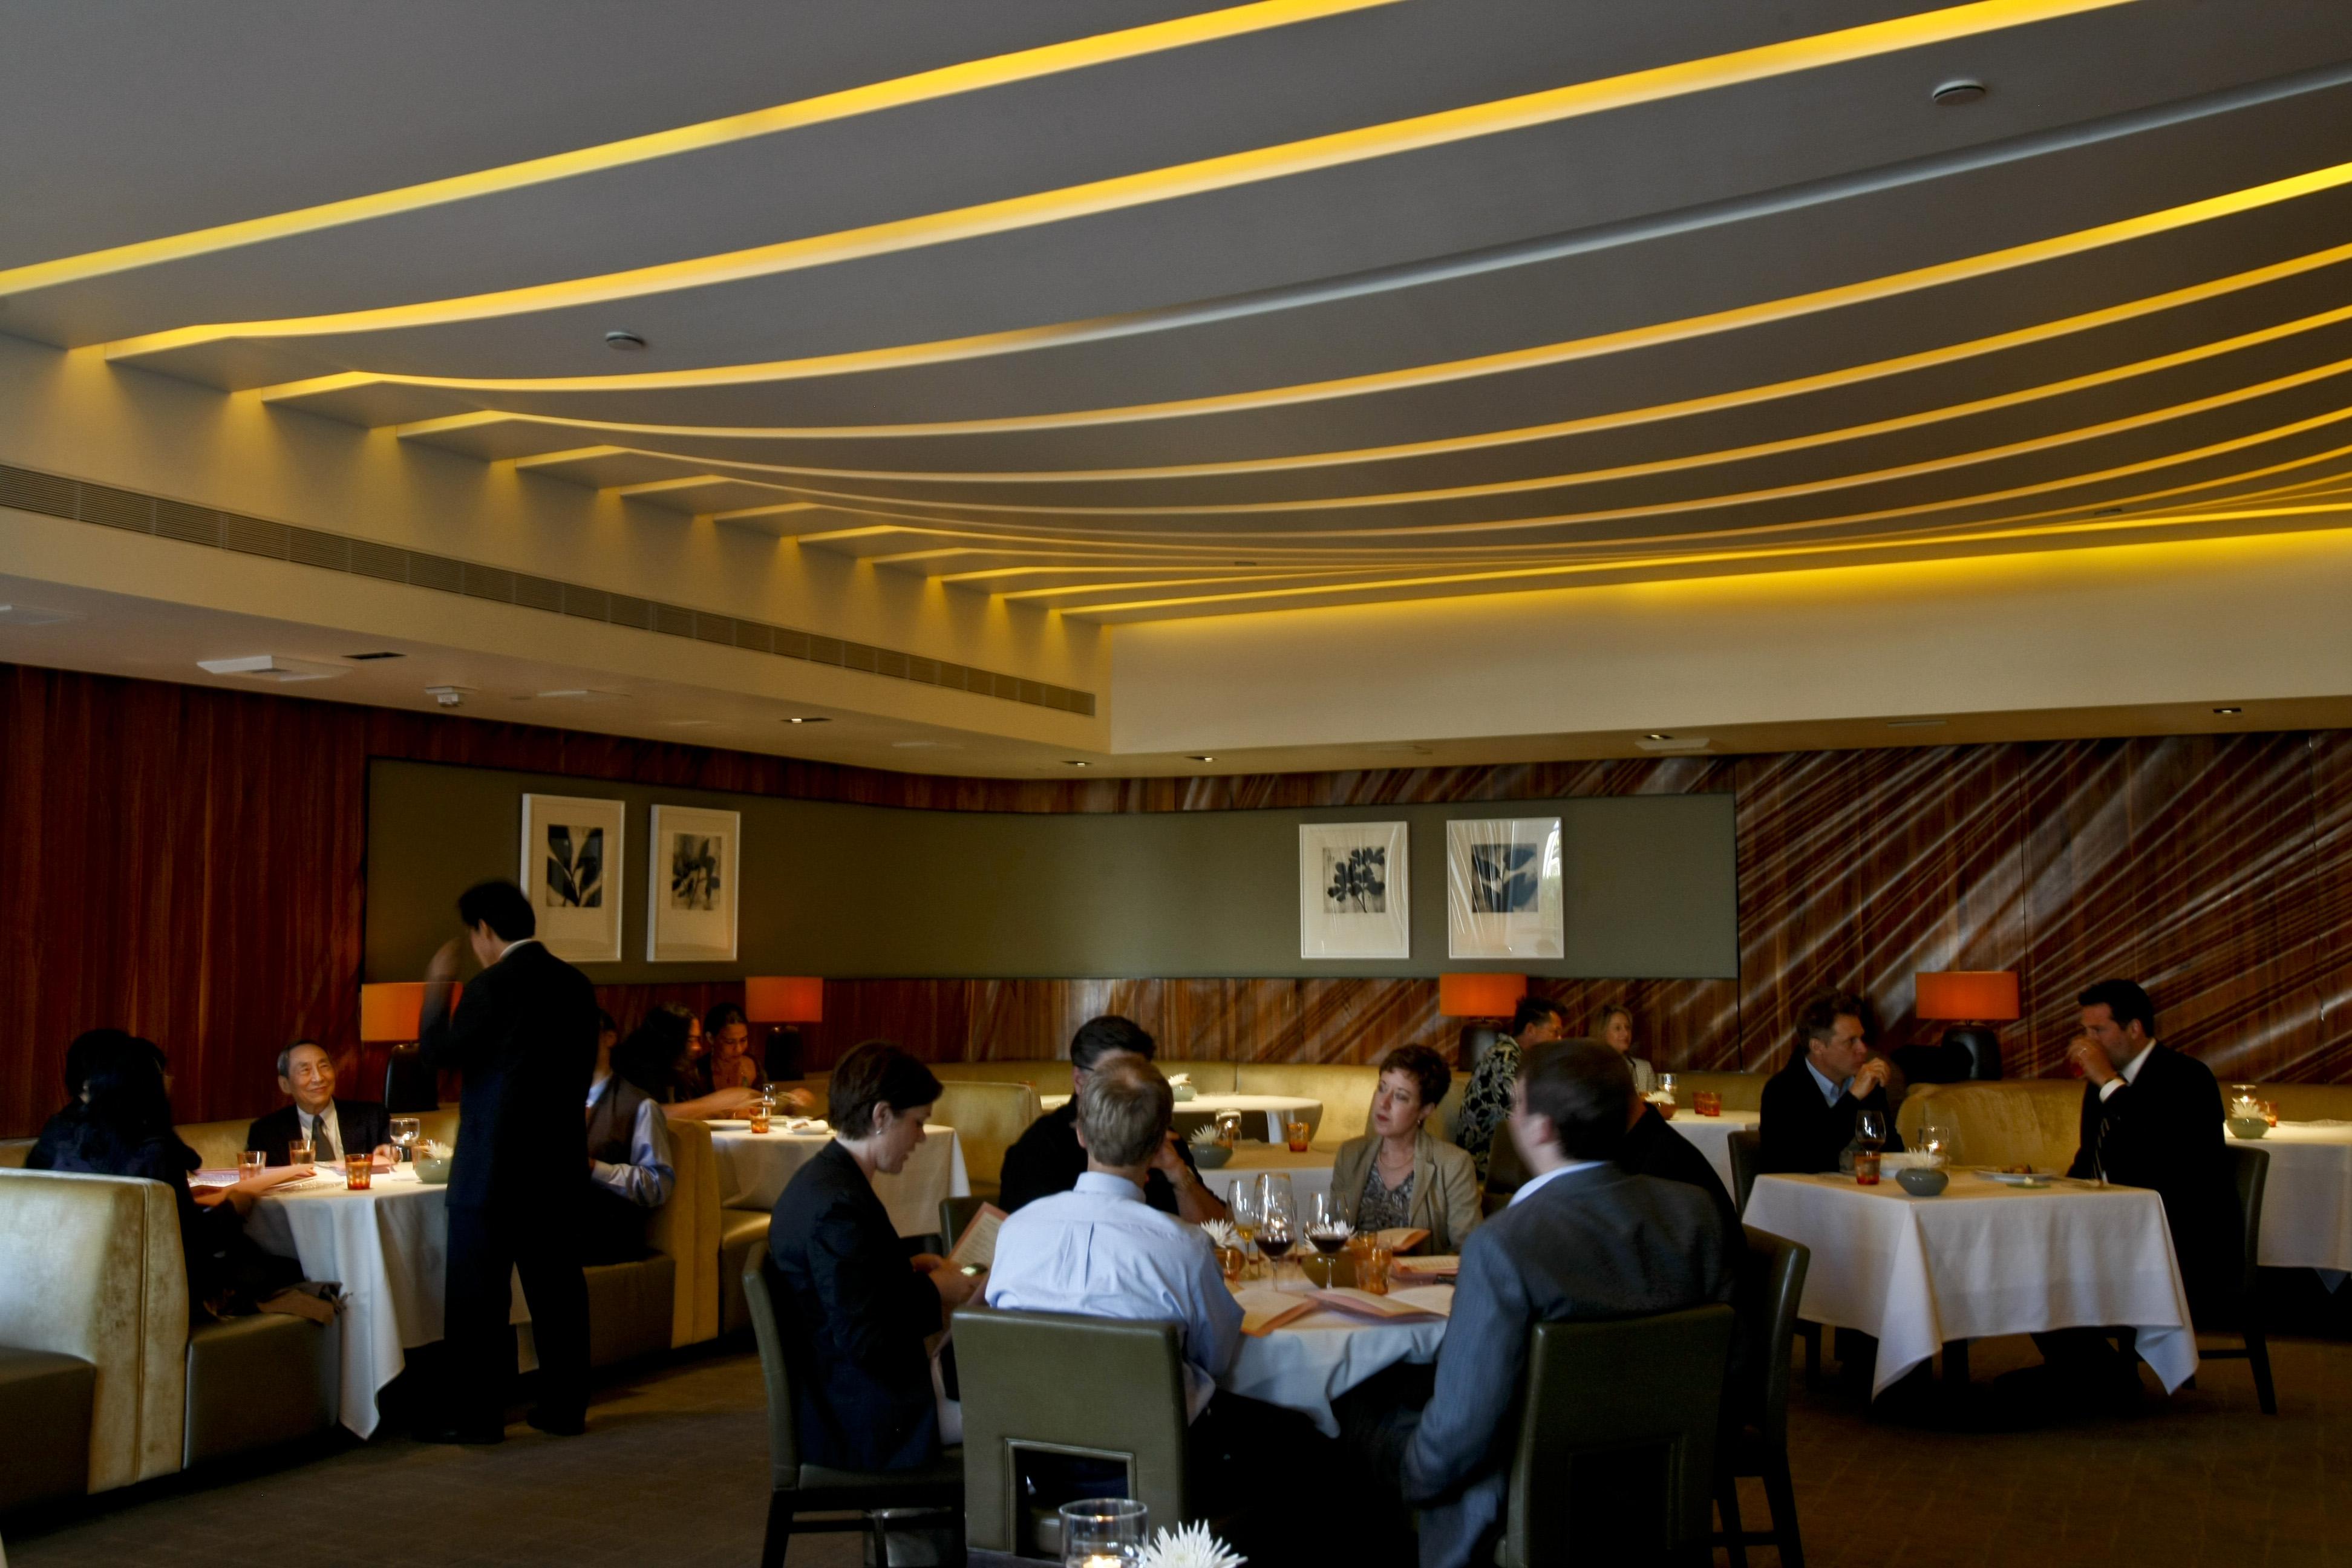 Diners enjoy dinner in the dinning room at Patina, an elegant restaurant at the Walt Disney Concert